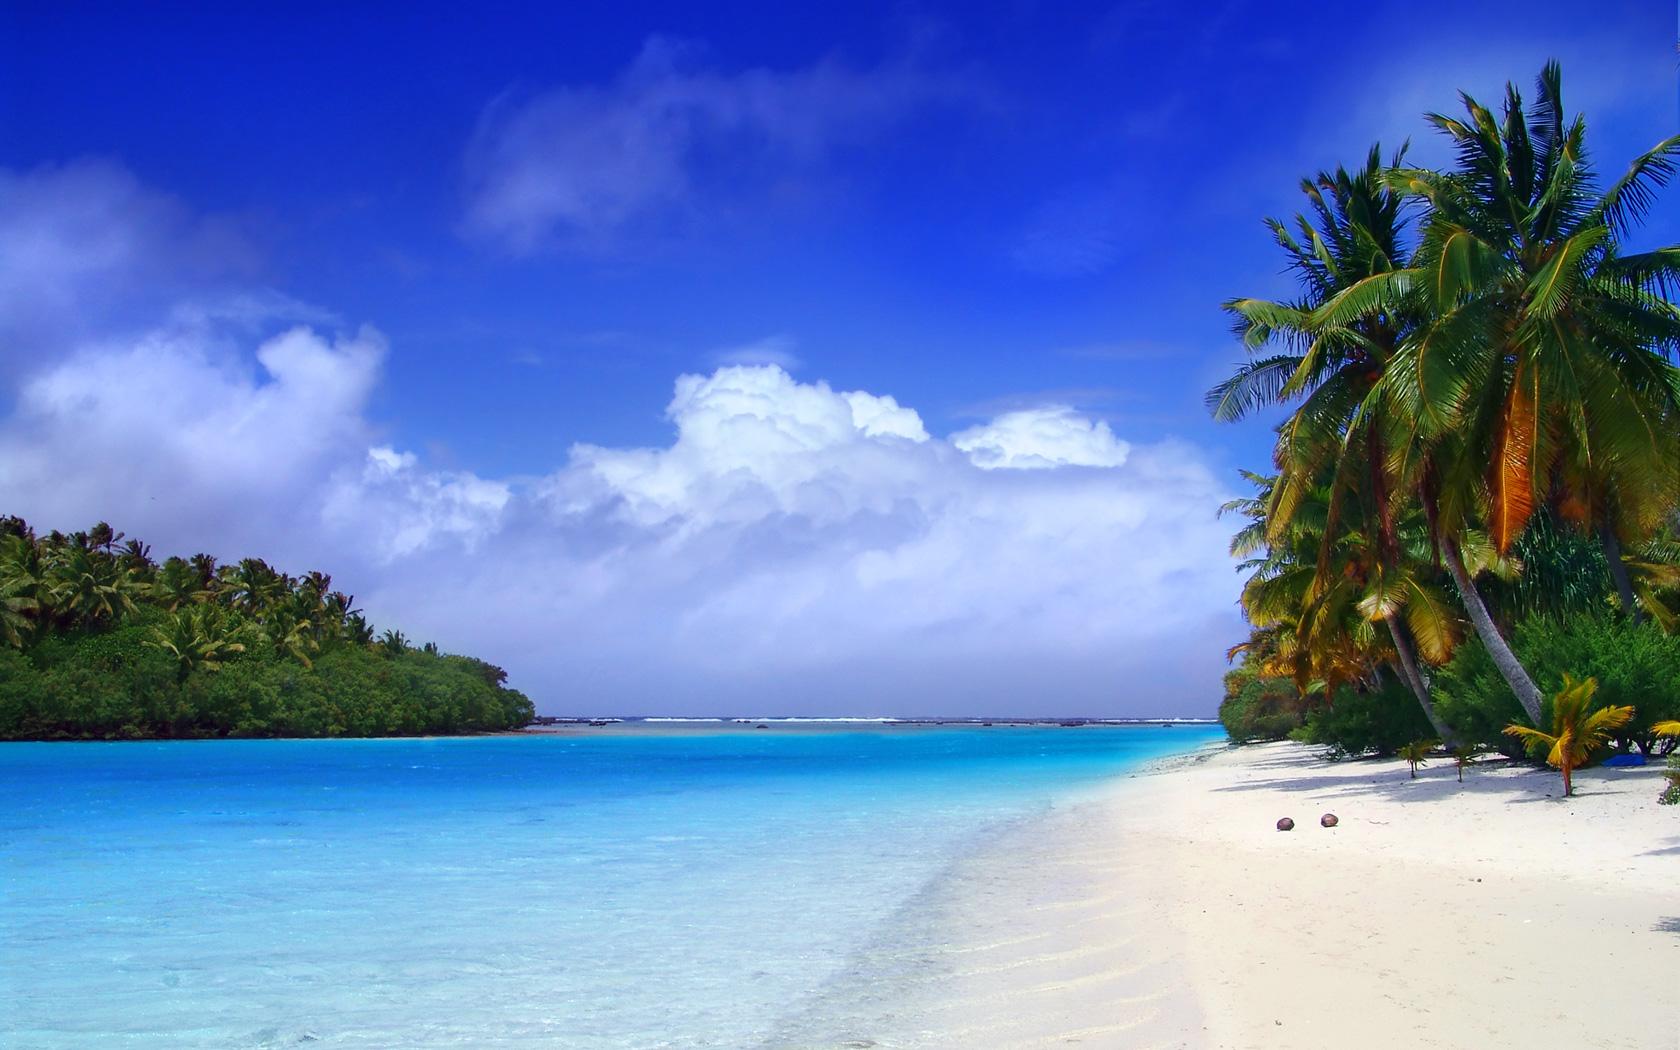 Hd Desktop Backgrounds 1680x1050: Beach Pictures For Desktop Background